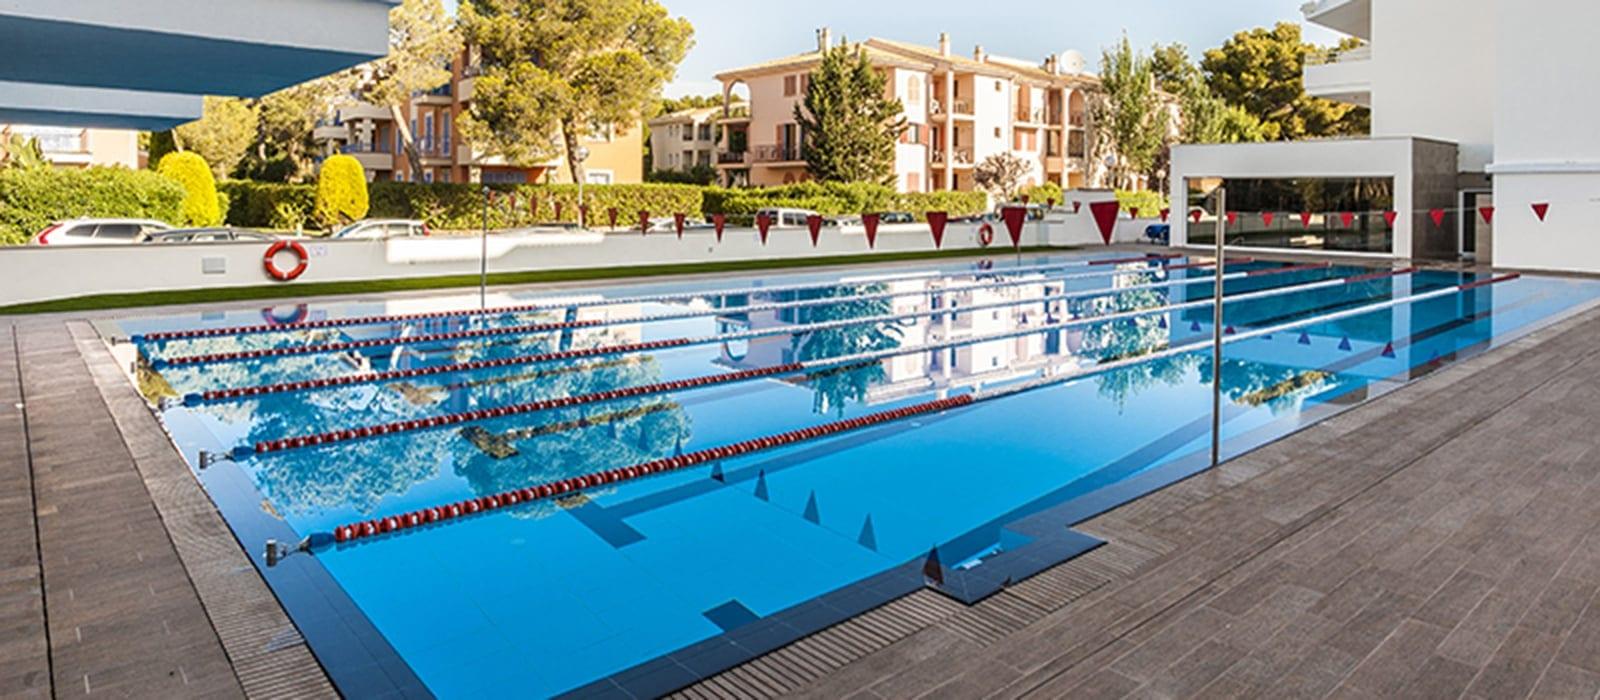 The lap pool at Sporthotel Villaconcha